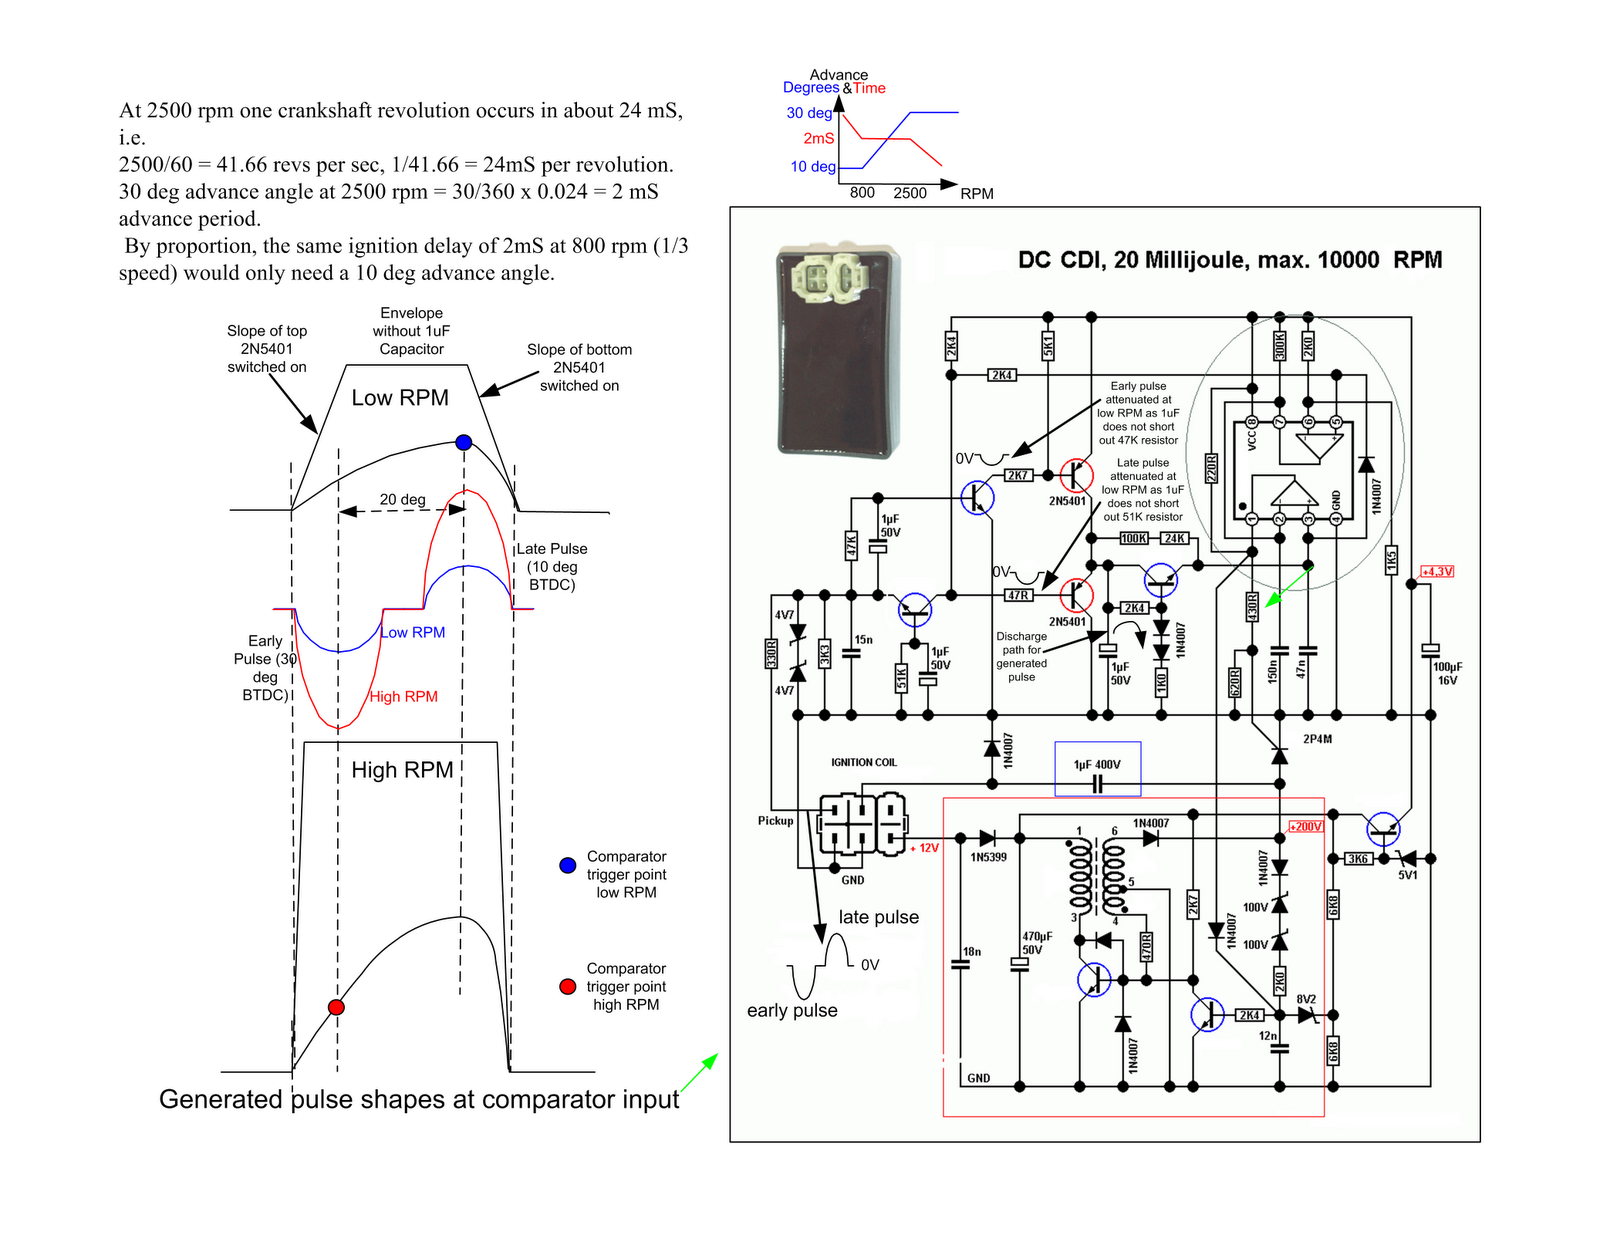 medium resolution of ng1 wiring diagram dc dc wiring diagrams 4 wire dc motor wiring diagram ng1 wiring diagram dc dc